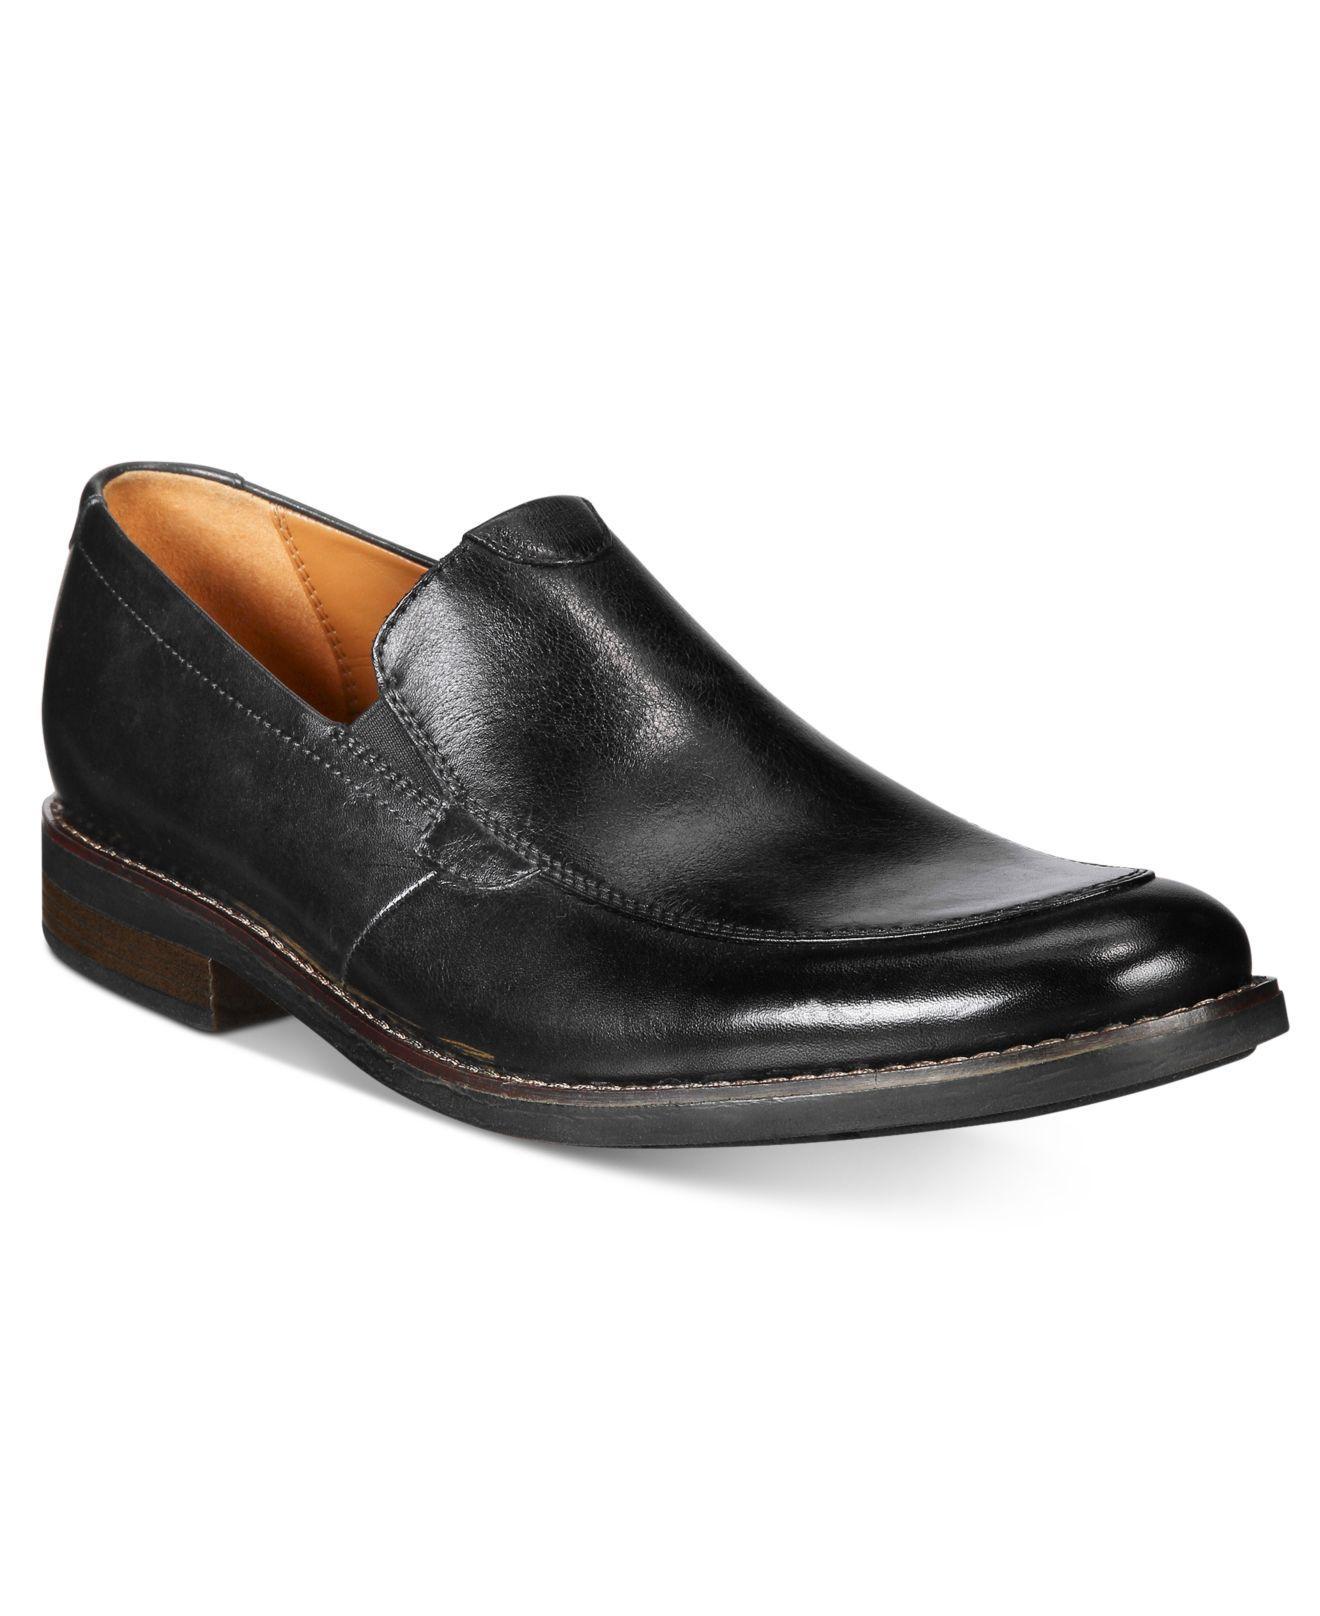 Macys New York Mens Shoes